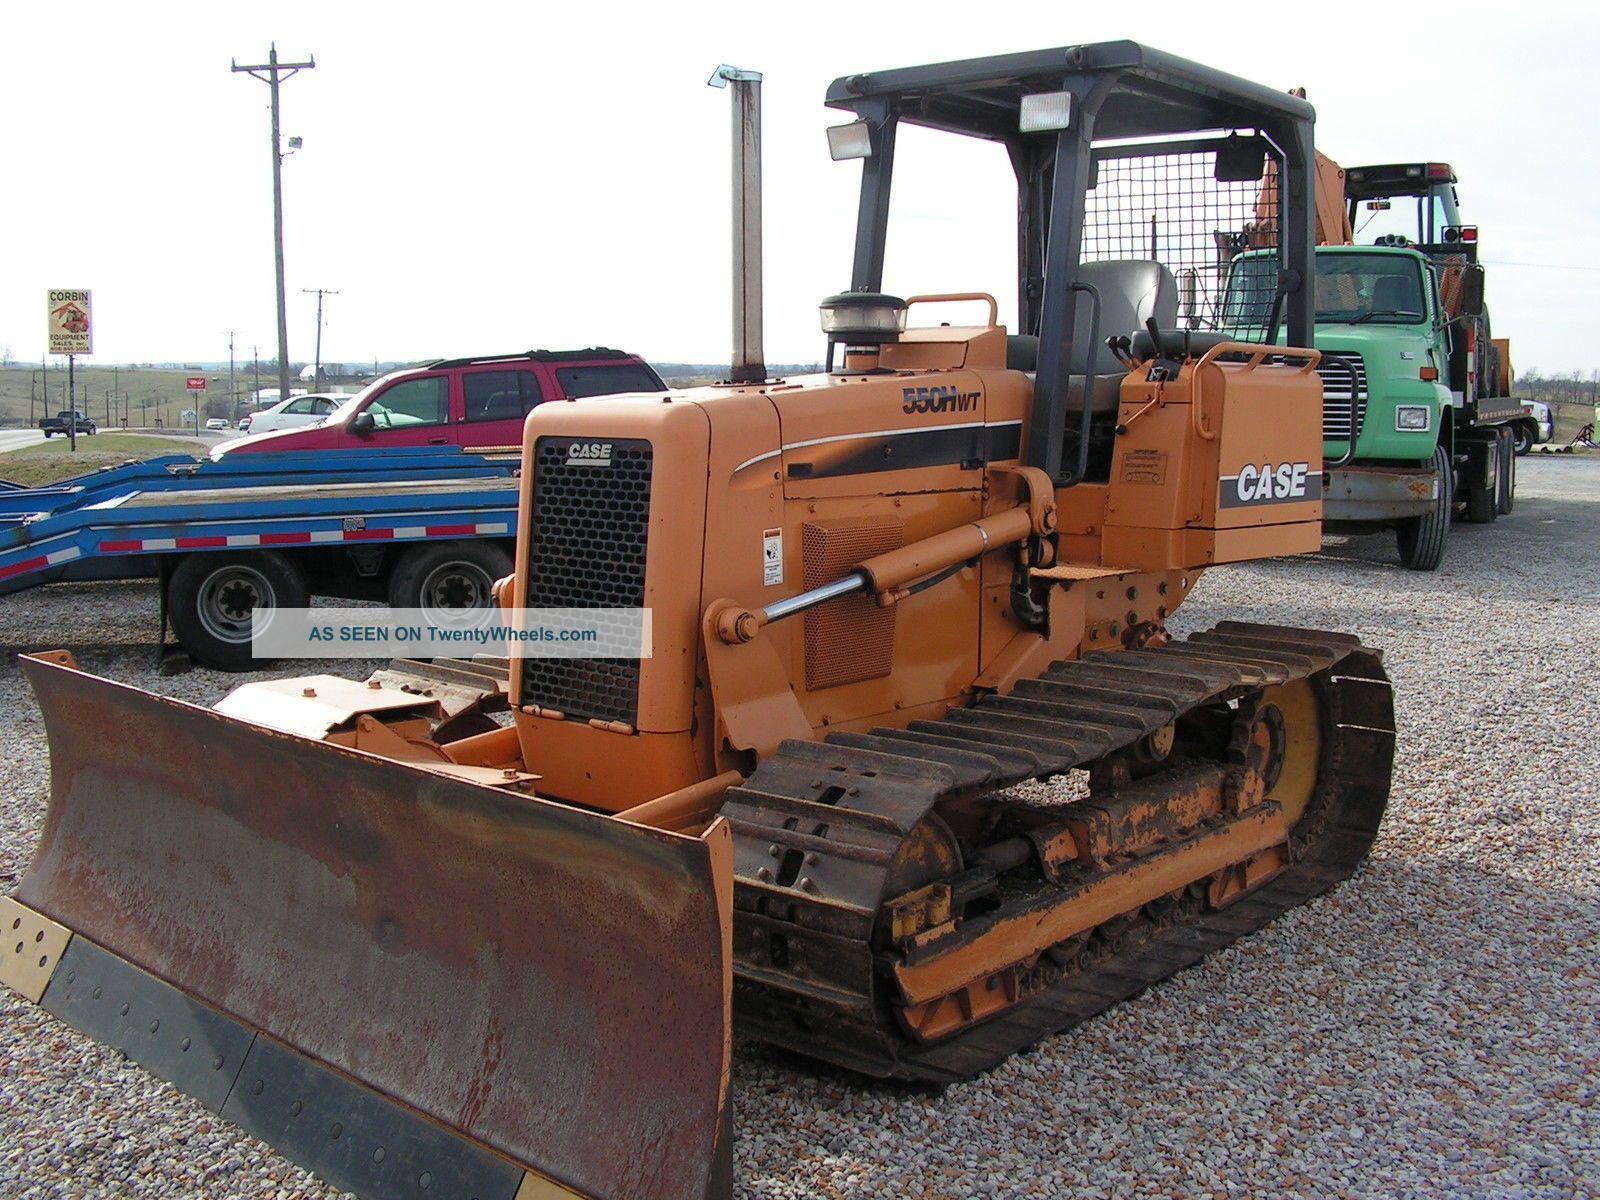 2006 Case 550h Dozer (wt Model)